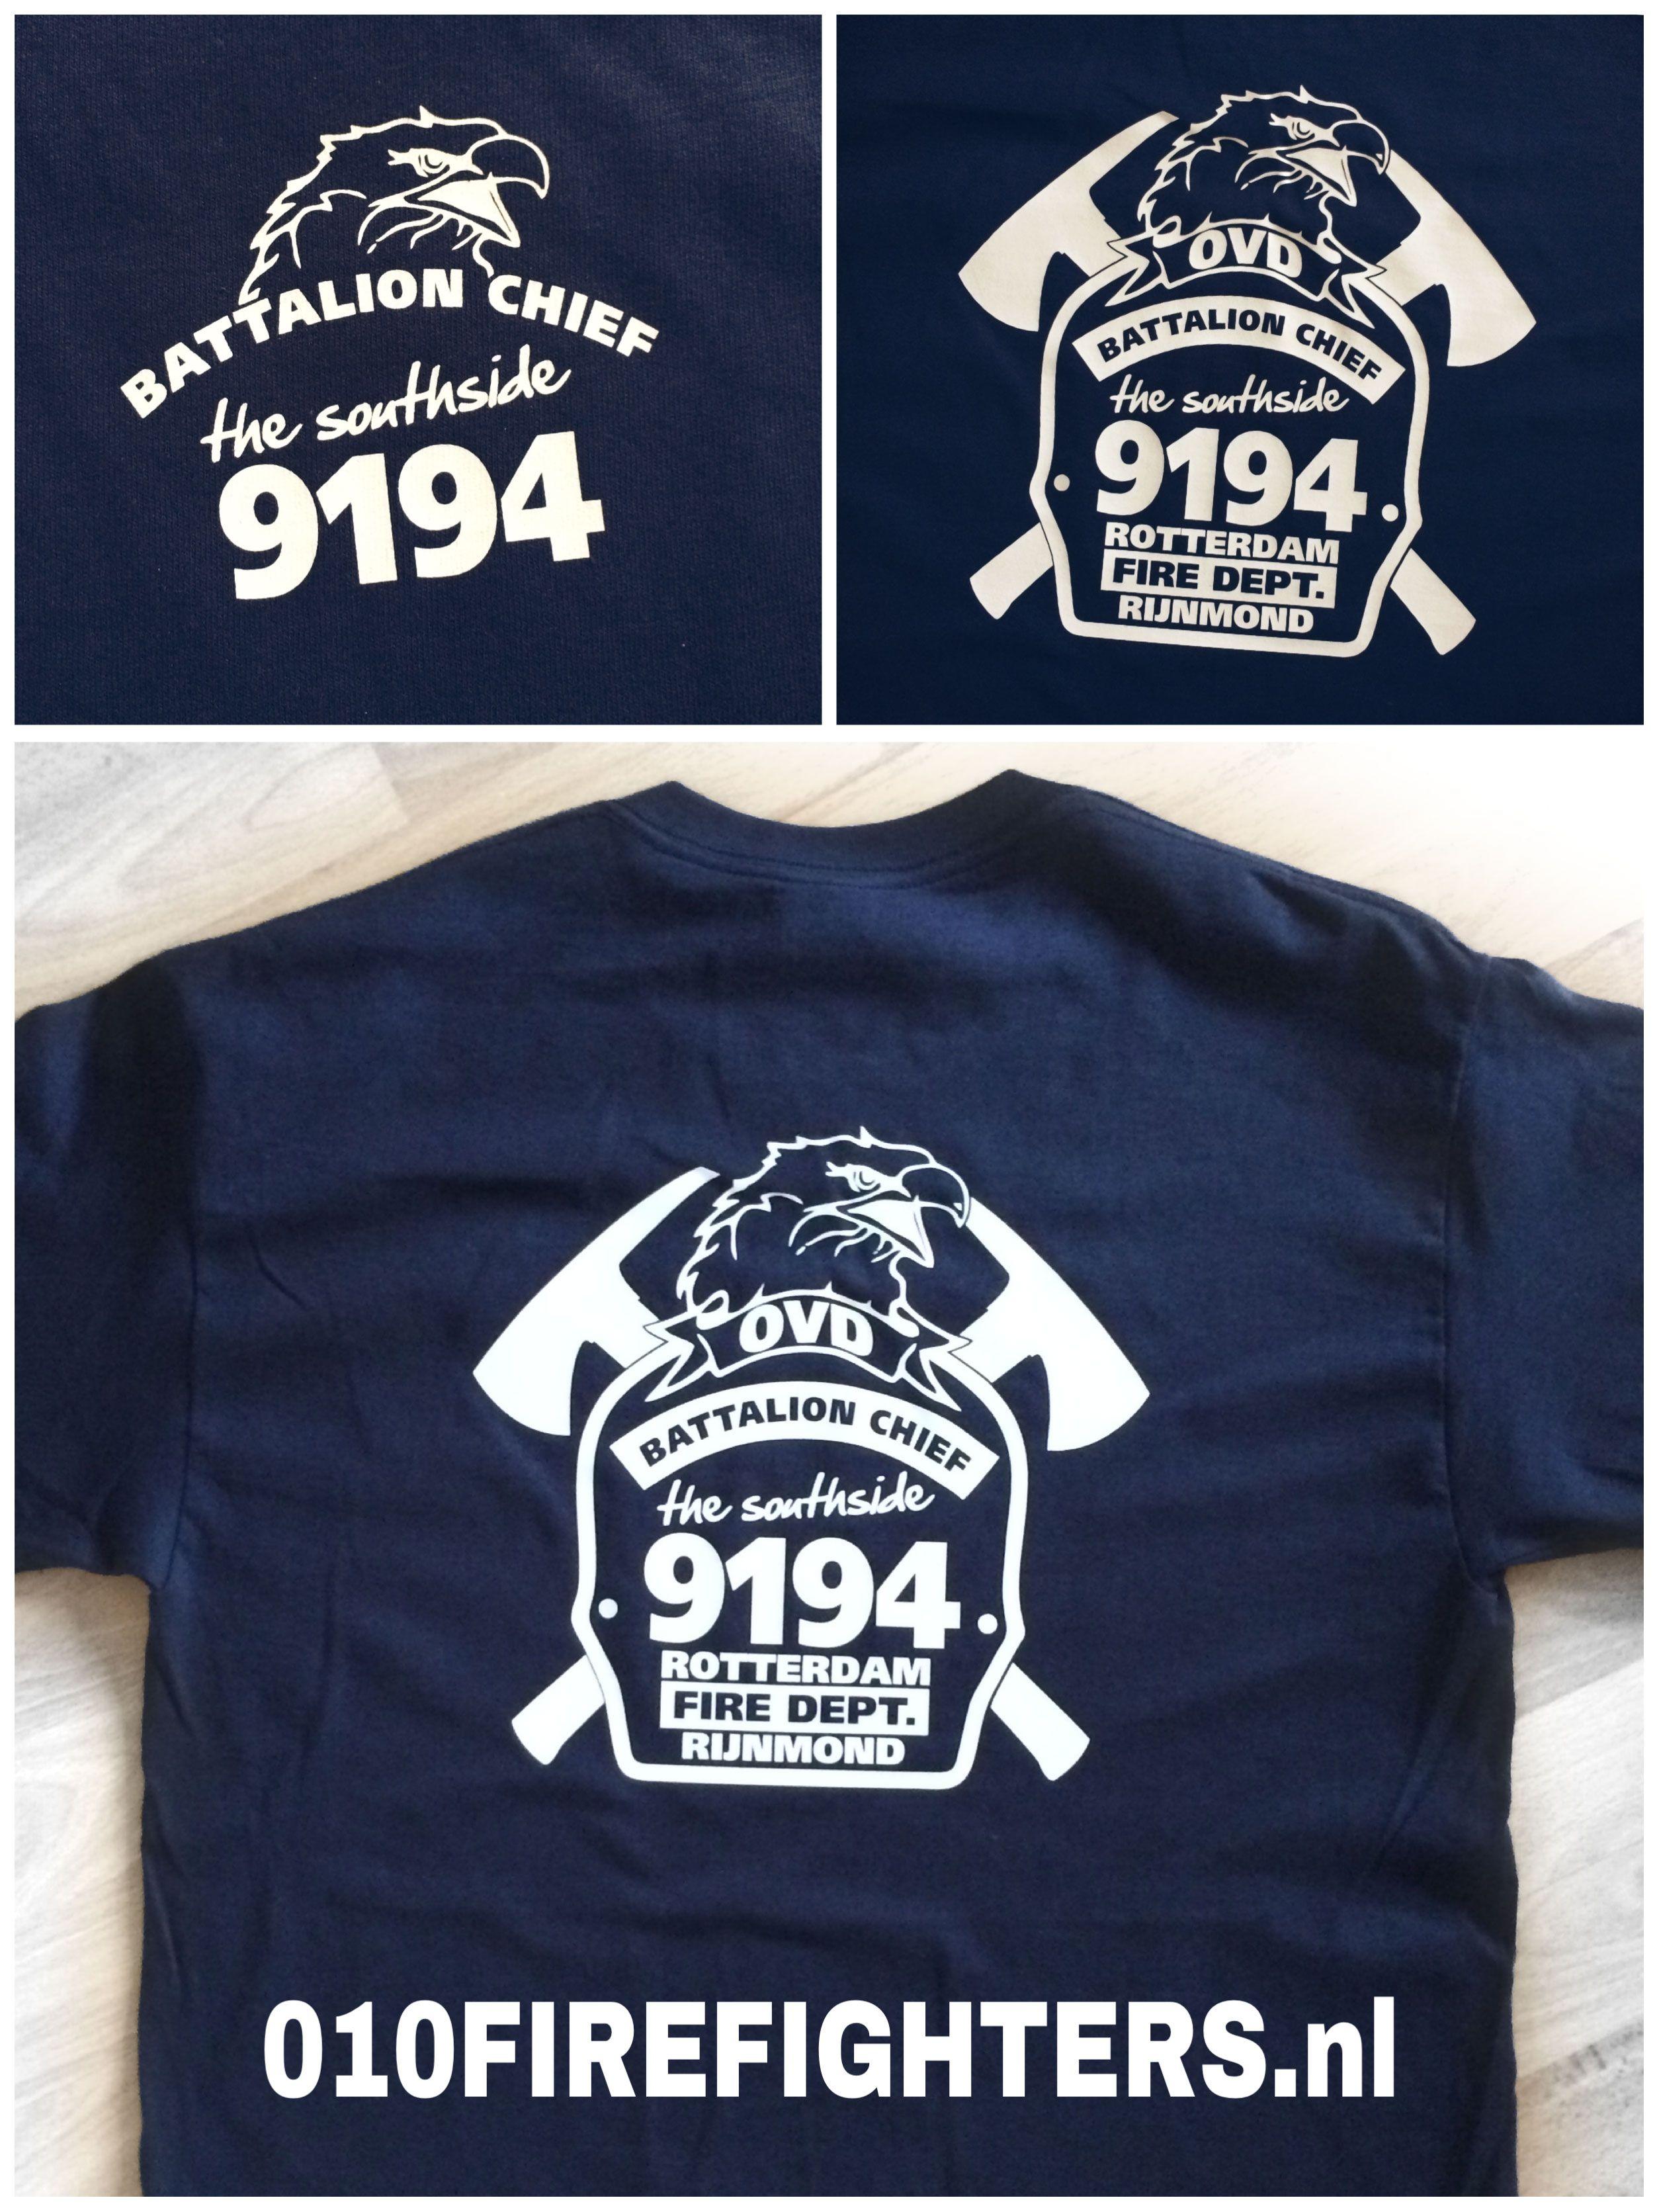 010FireFighters.nl | Firefighters Bodywear - Battalion Chief - OD 9194 Rotterdam Fire Department